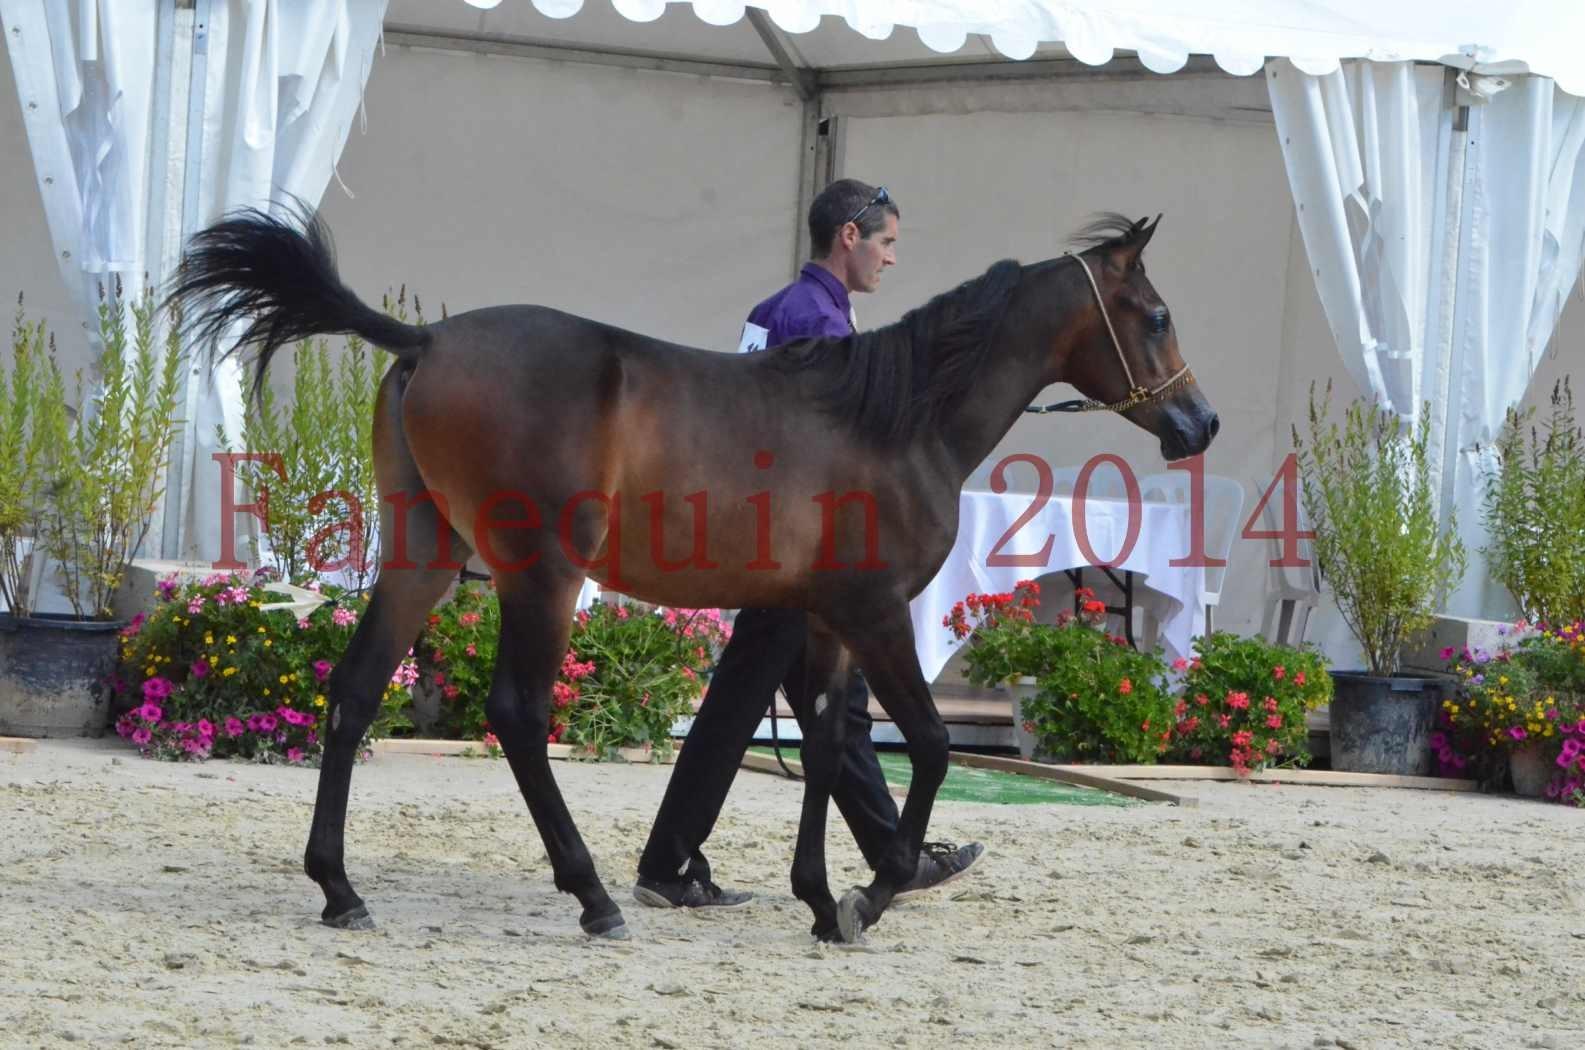 Championnat de FRANCE 2014 - Amateurs - SH FARAJAA - 12